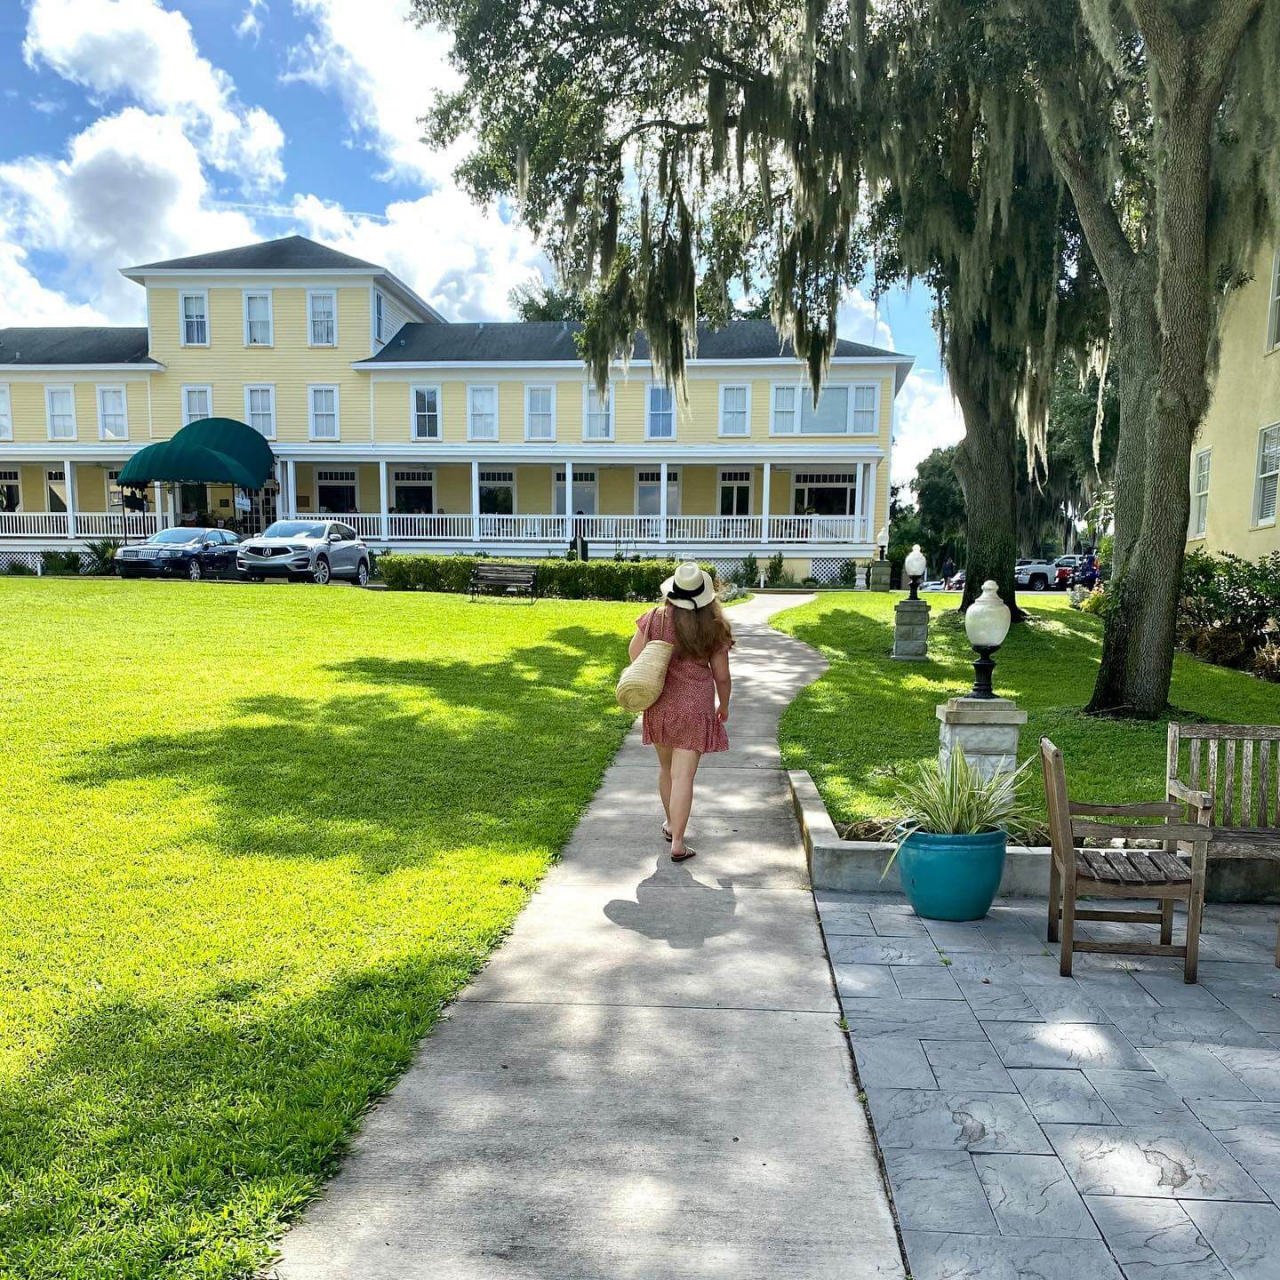 Step Inside The Lakeside Inn, Florida's Oldest Hotel